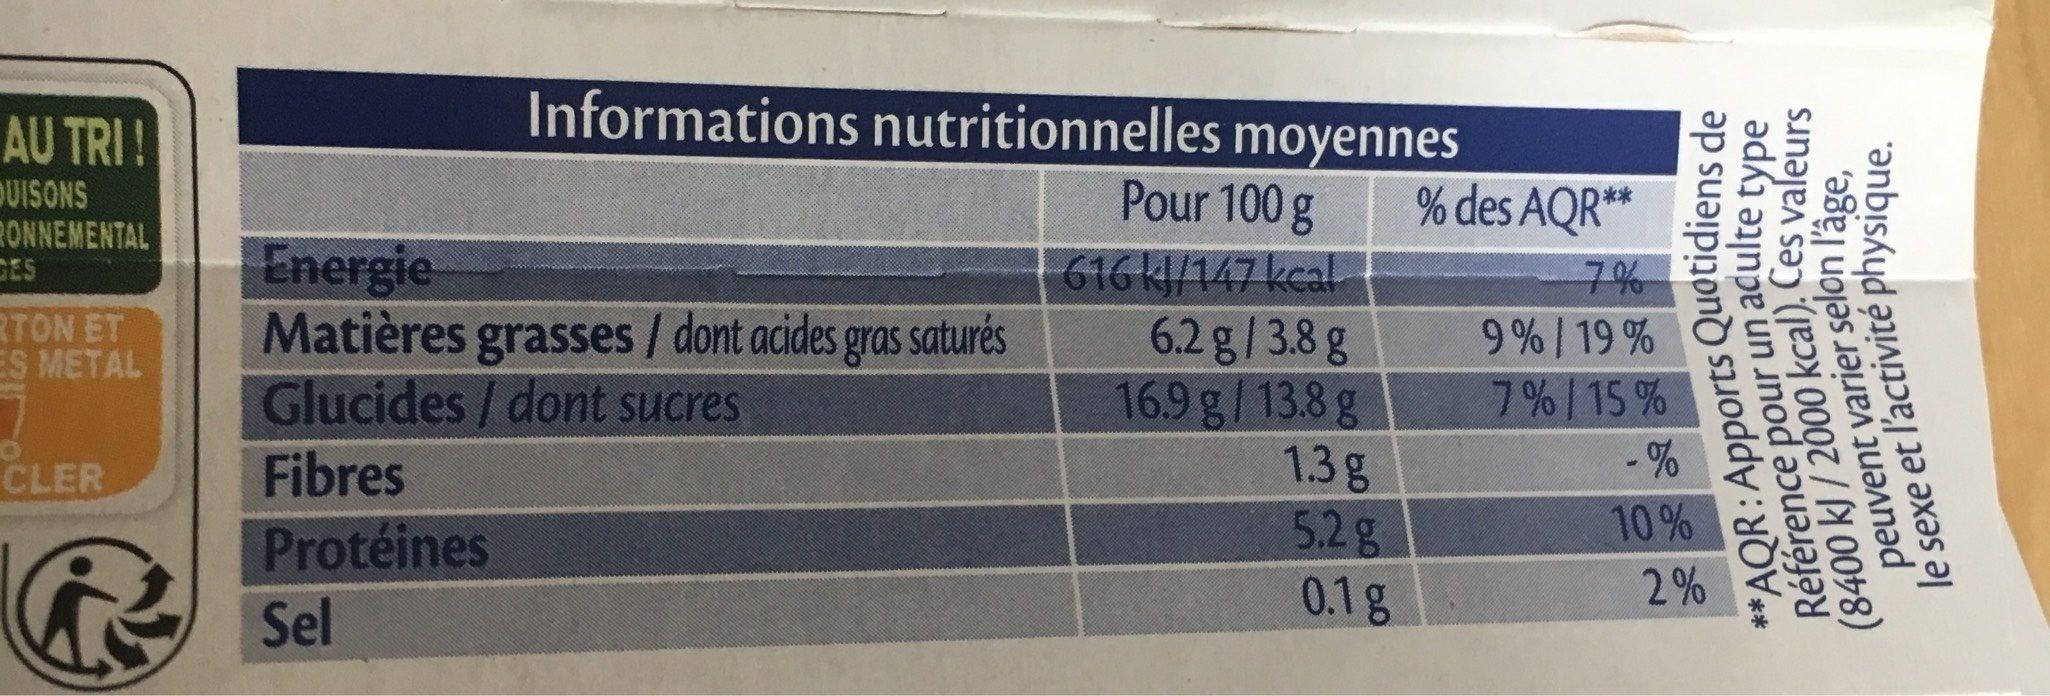 Crème au chocolat - Voedingswaarden